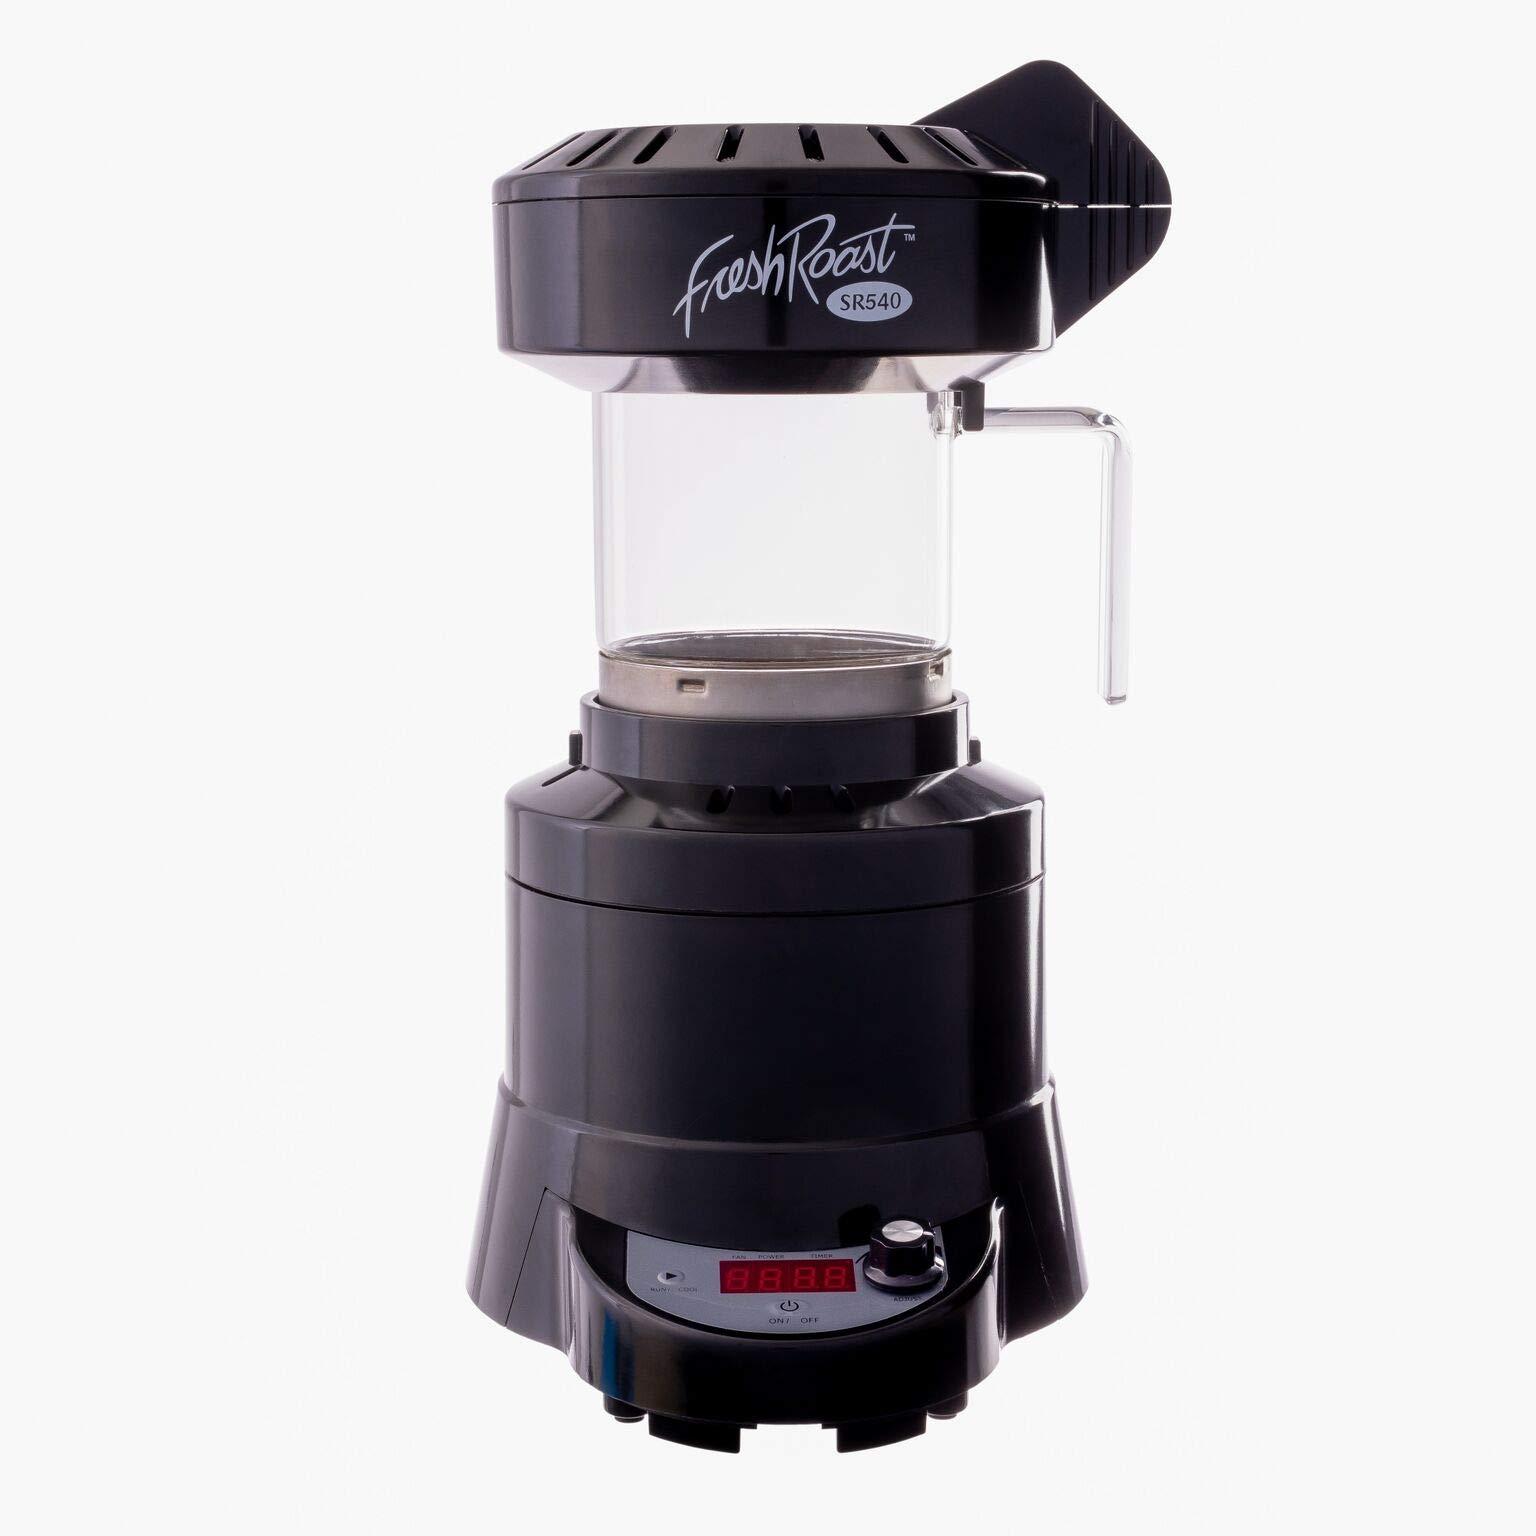 FreshRoast SR540 (4.6oz) Home Coffee Roaster + free green coffee sampler